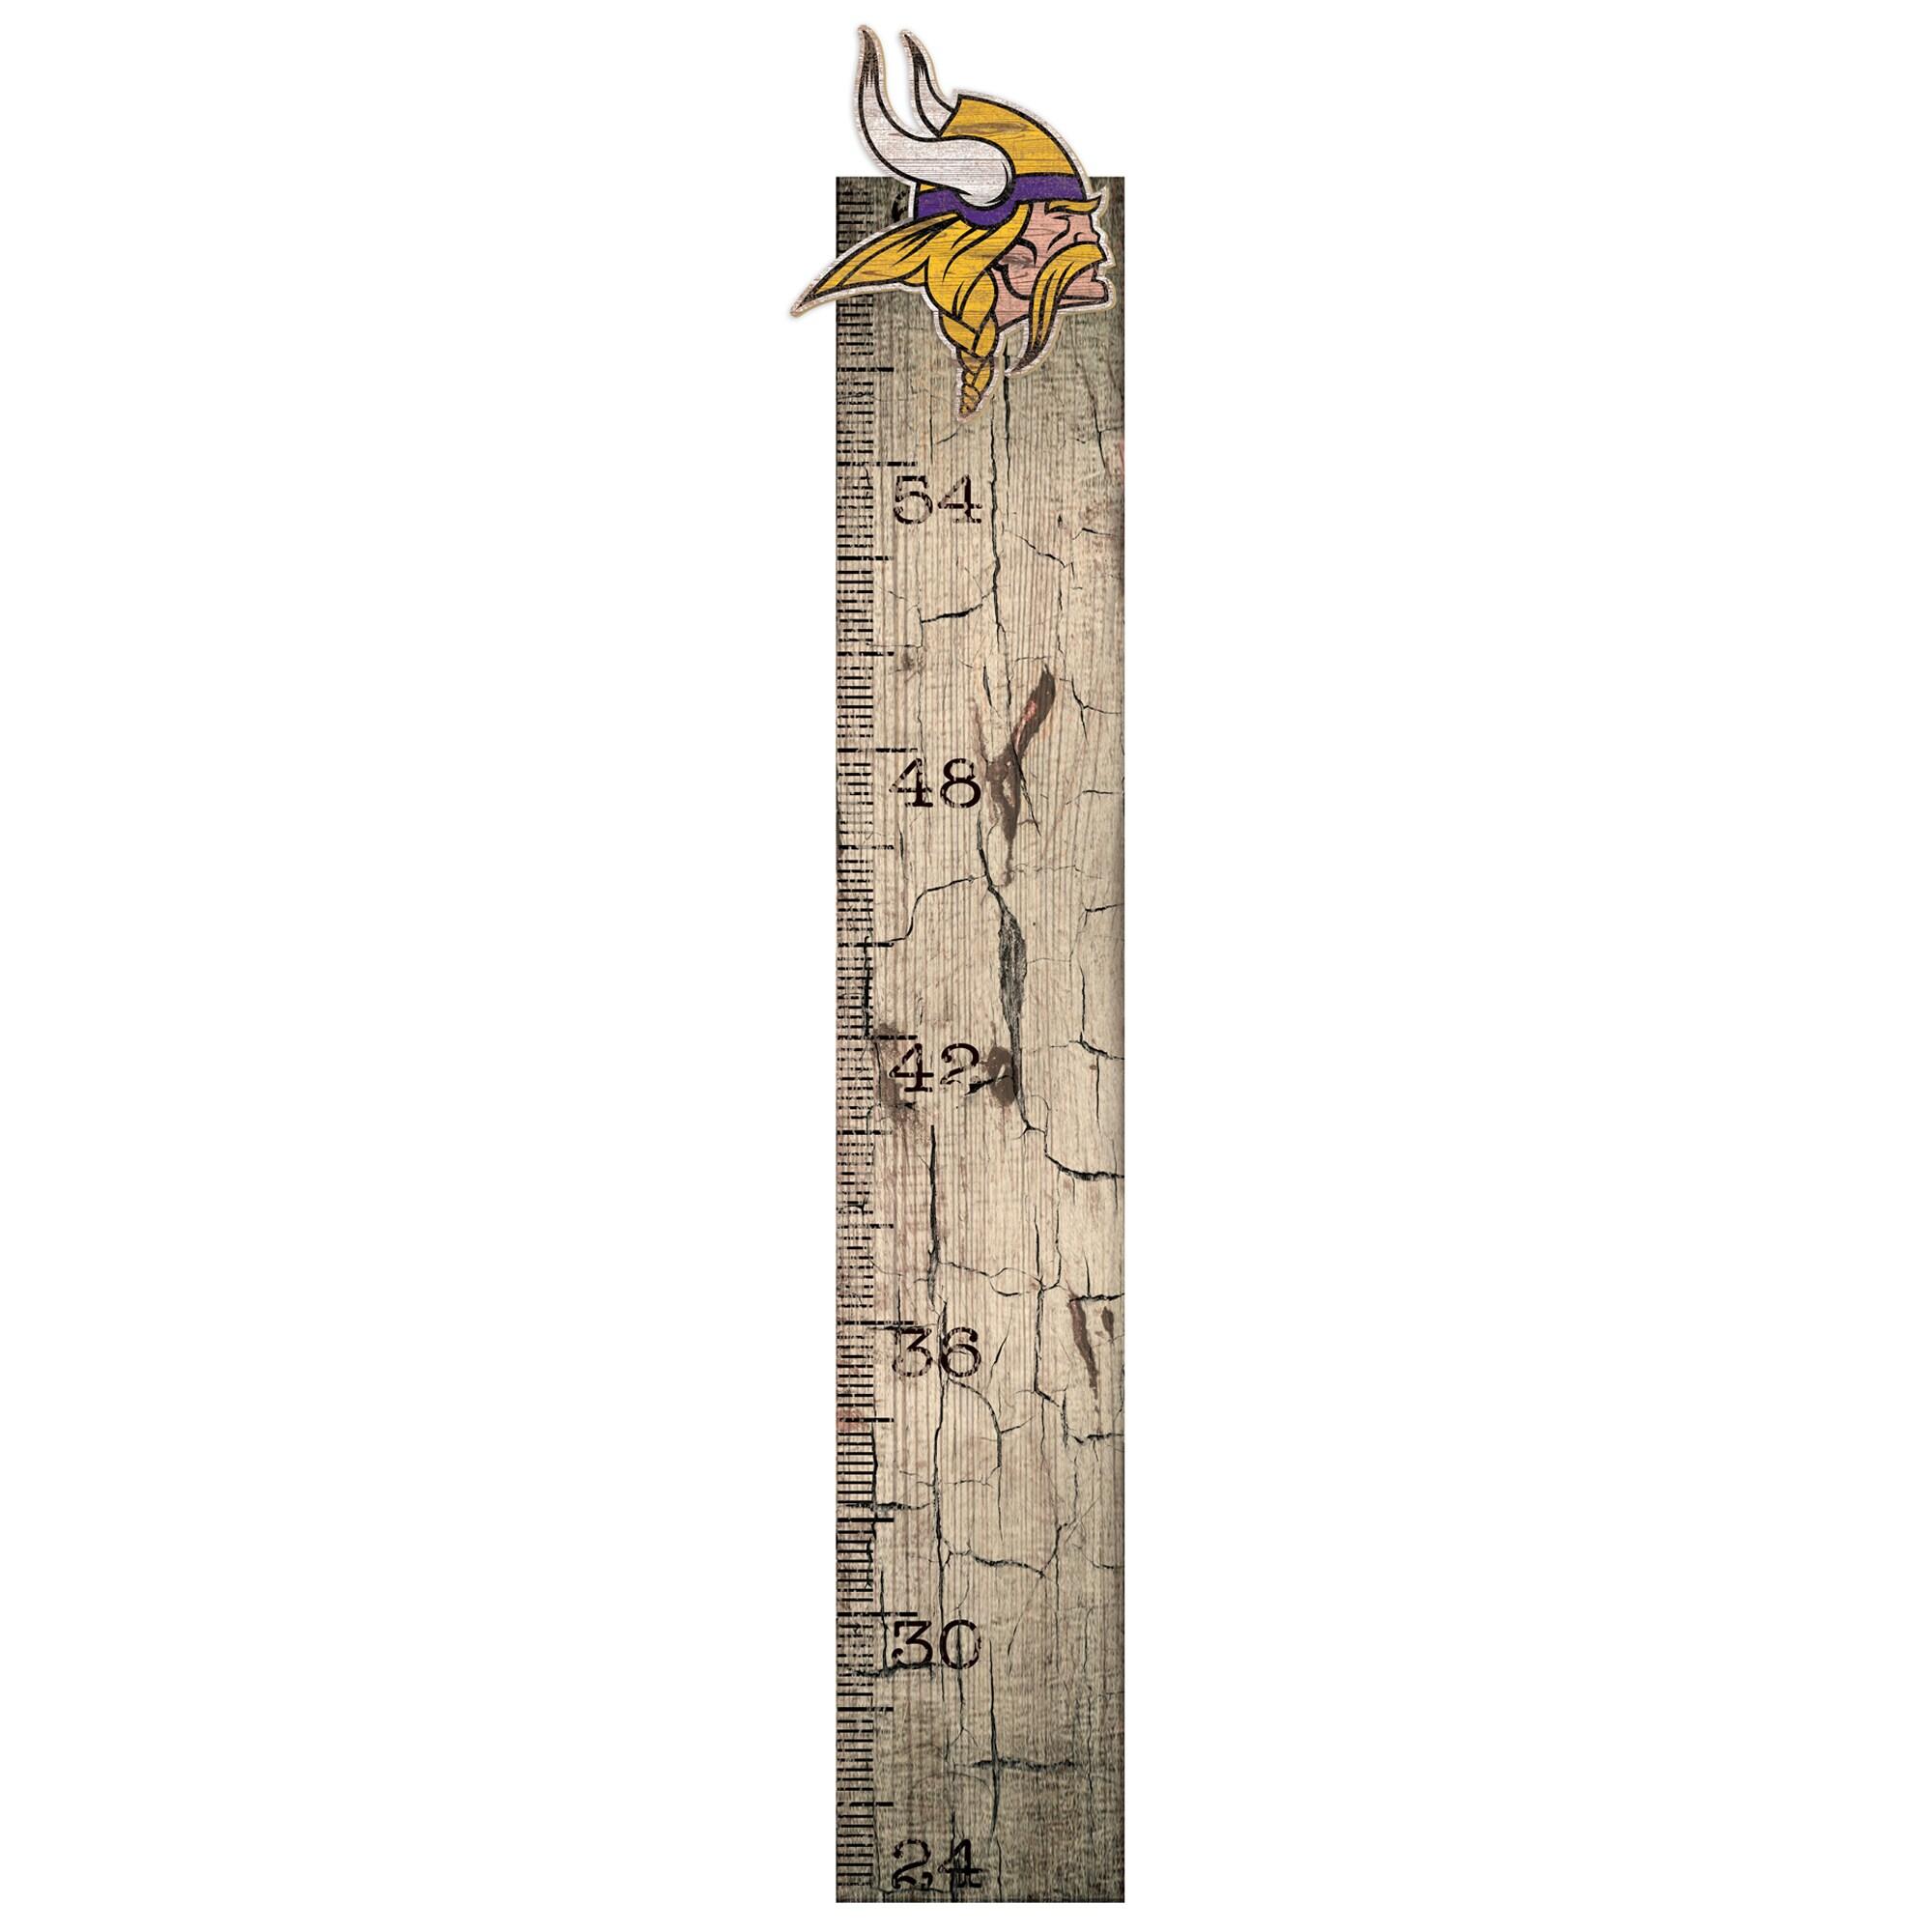 "Minnesota Vikings 6"" x 36"" Growth Chart Sign"